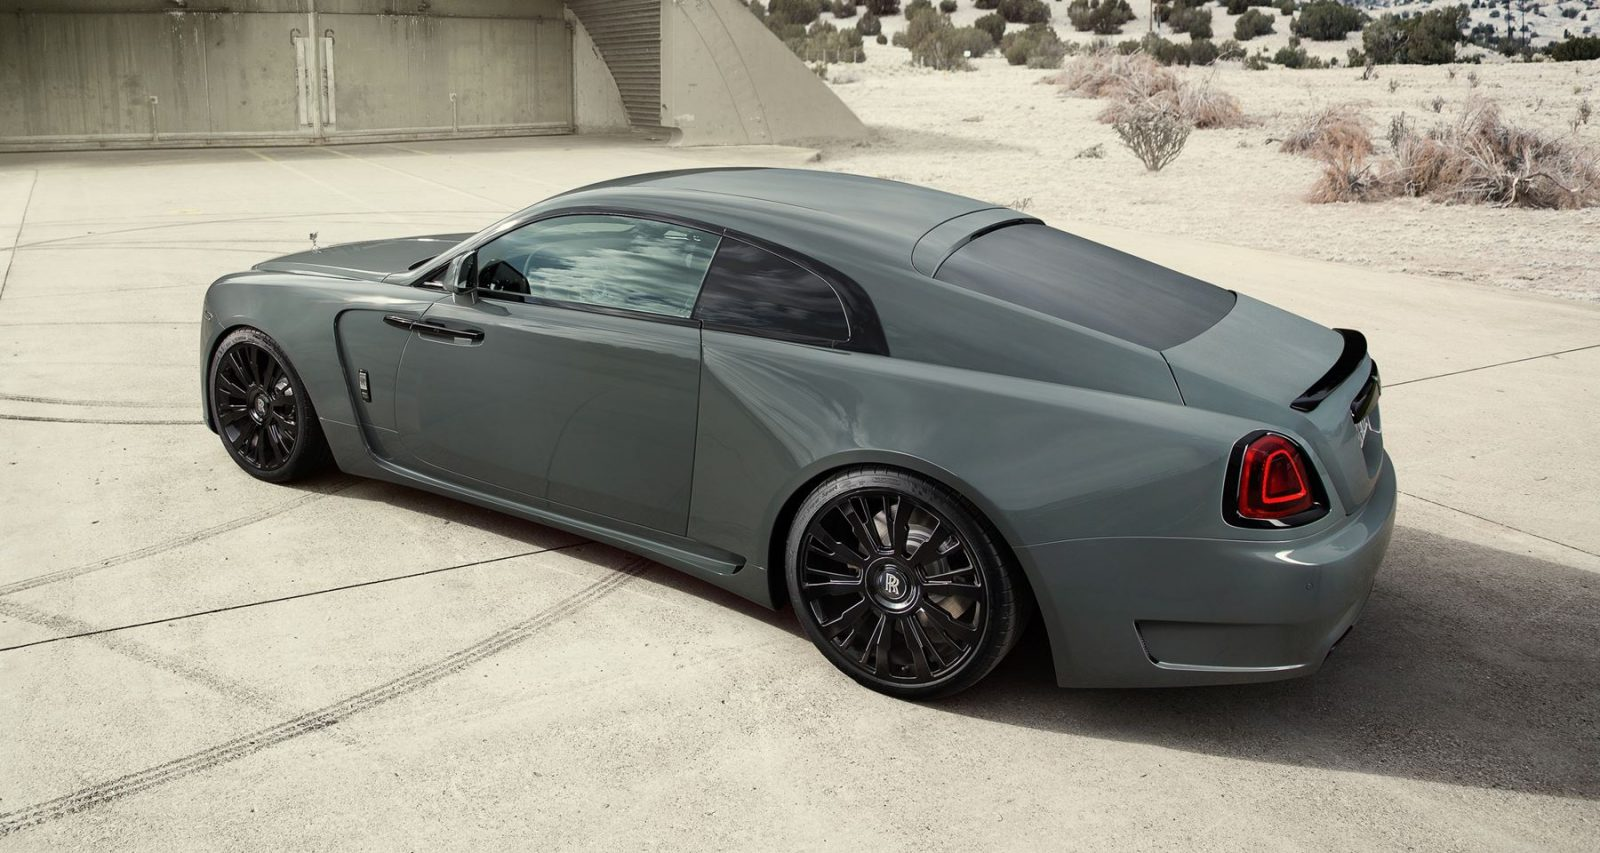 Rolls Royce Wraith Accessories >> 2016 SPOFEC Rolls Royce Wraith OVERDOSE - 717HP Widebody Dream!